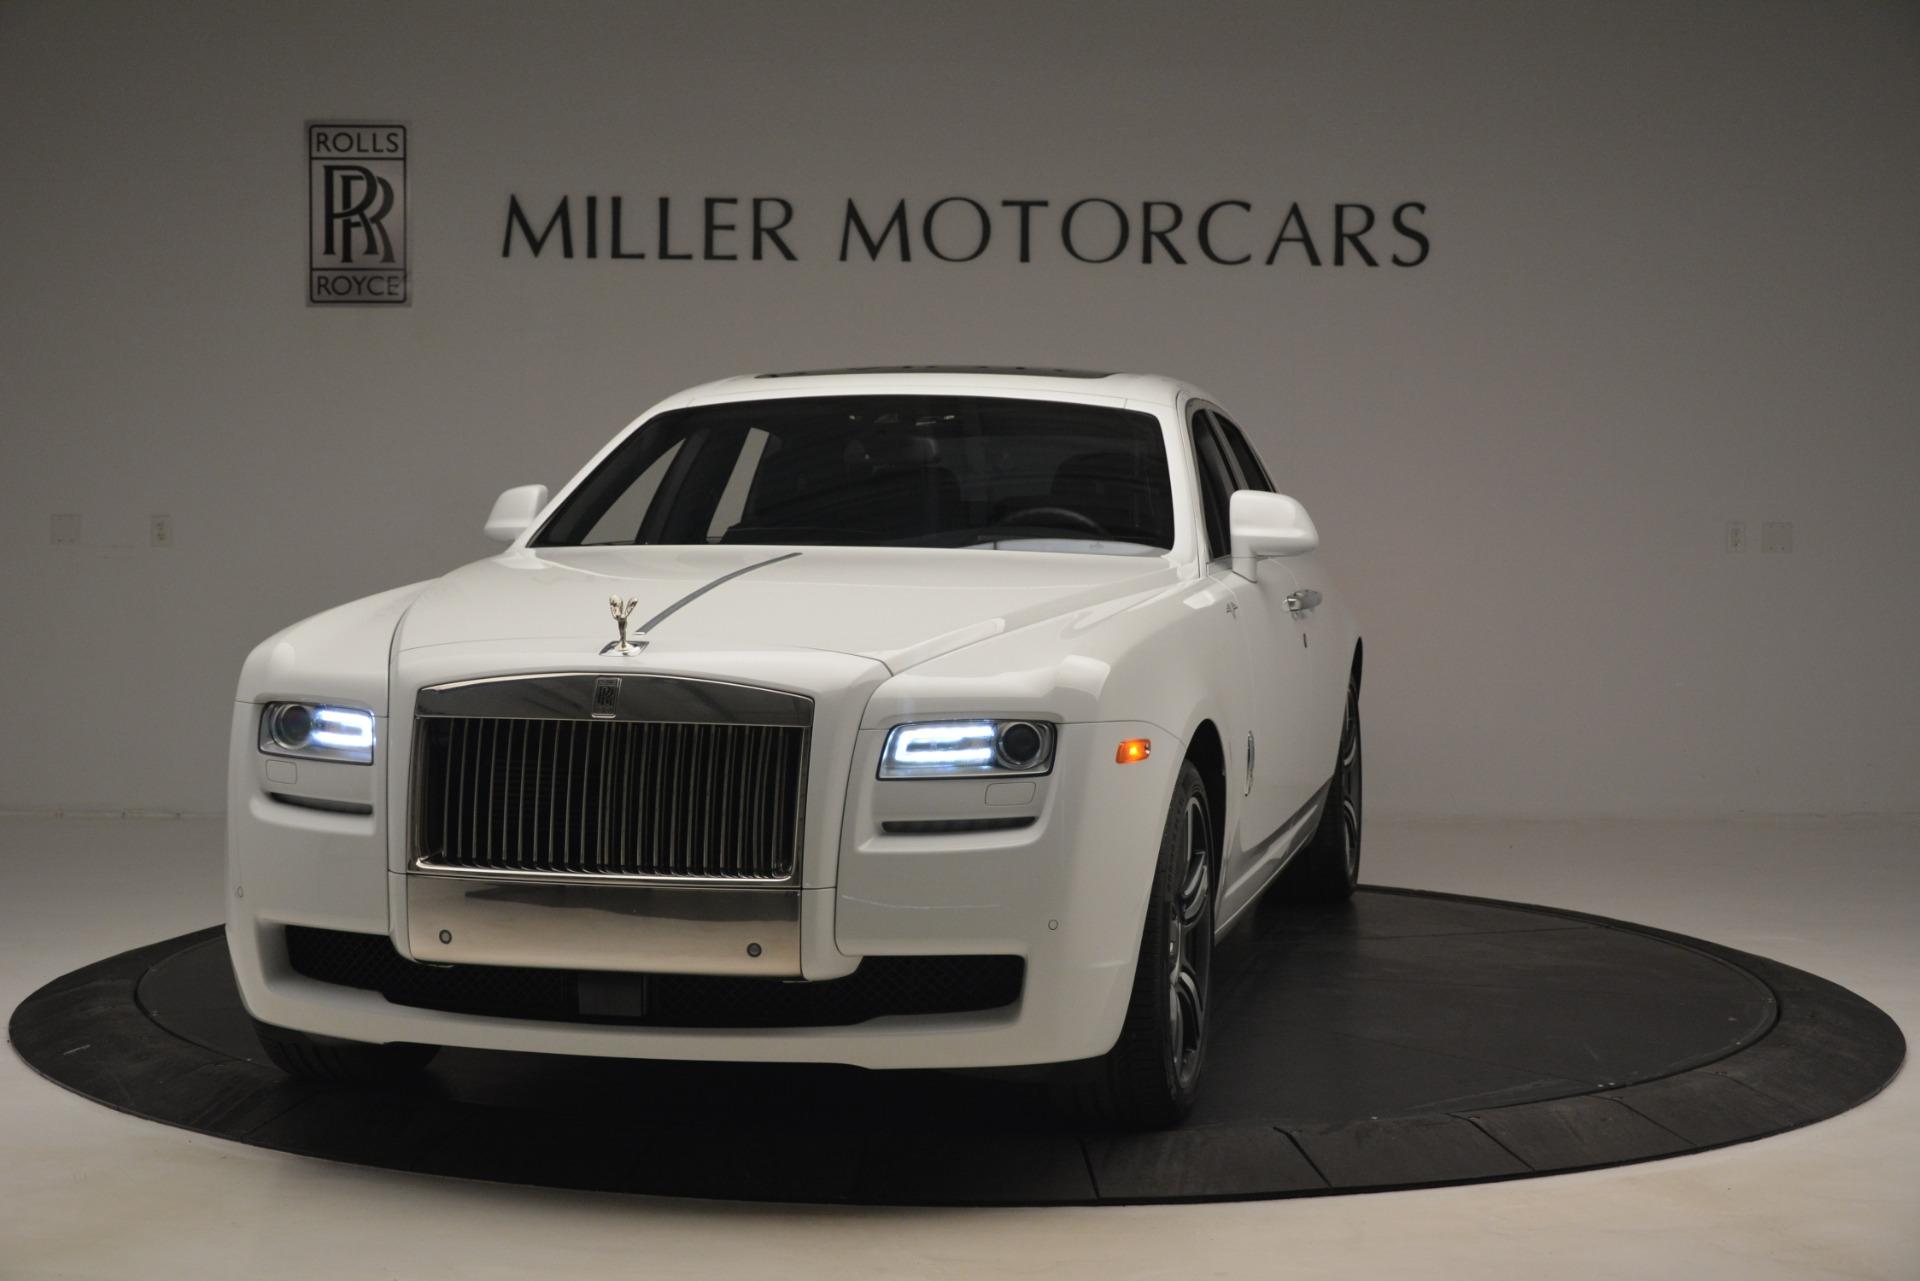 Used 2014 Rolls-Royce Ghost V-Spec For Sale In Westport, CT 2989_p3